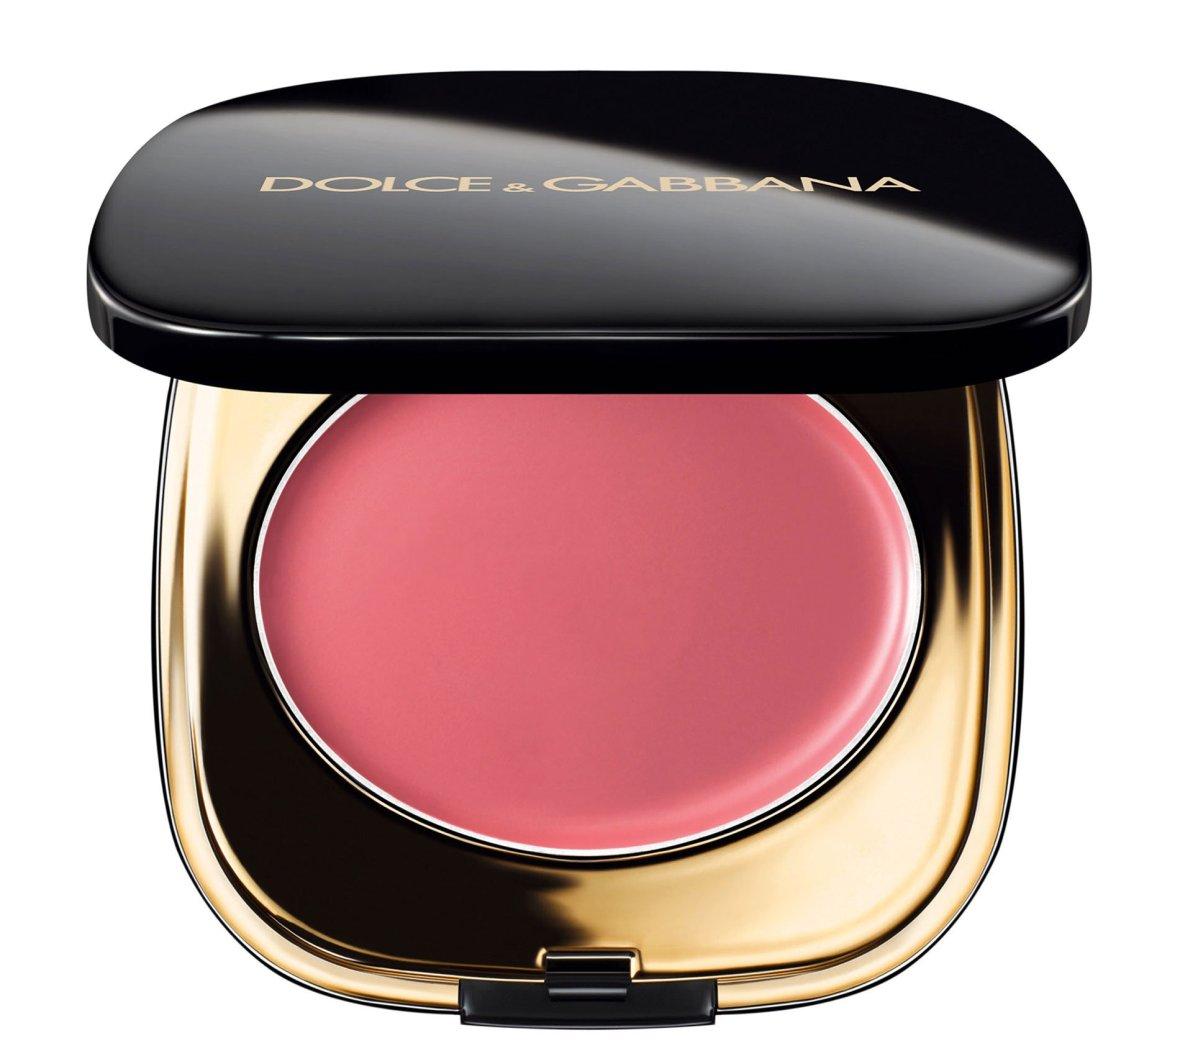 Кремовые румяна - Dolce & Gabbana Creamy Blush Оттенок #30 Rose Carina